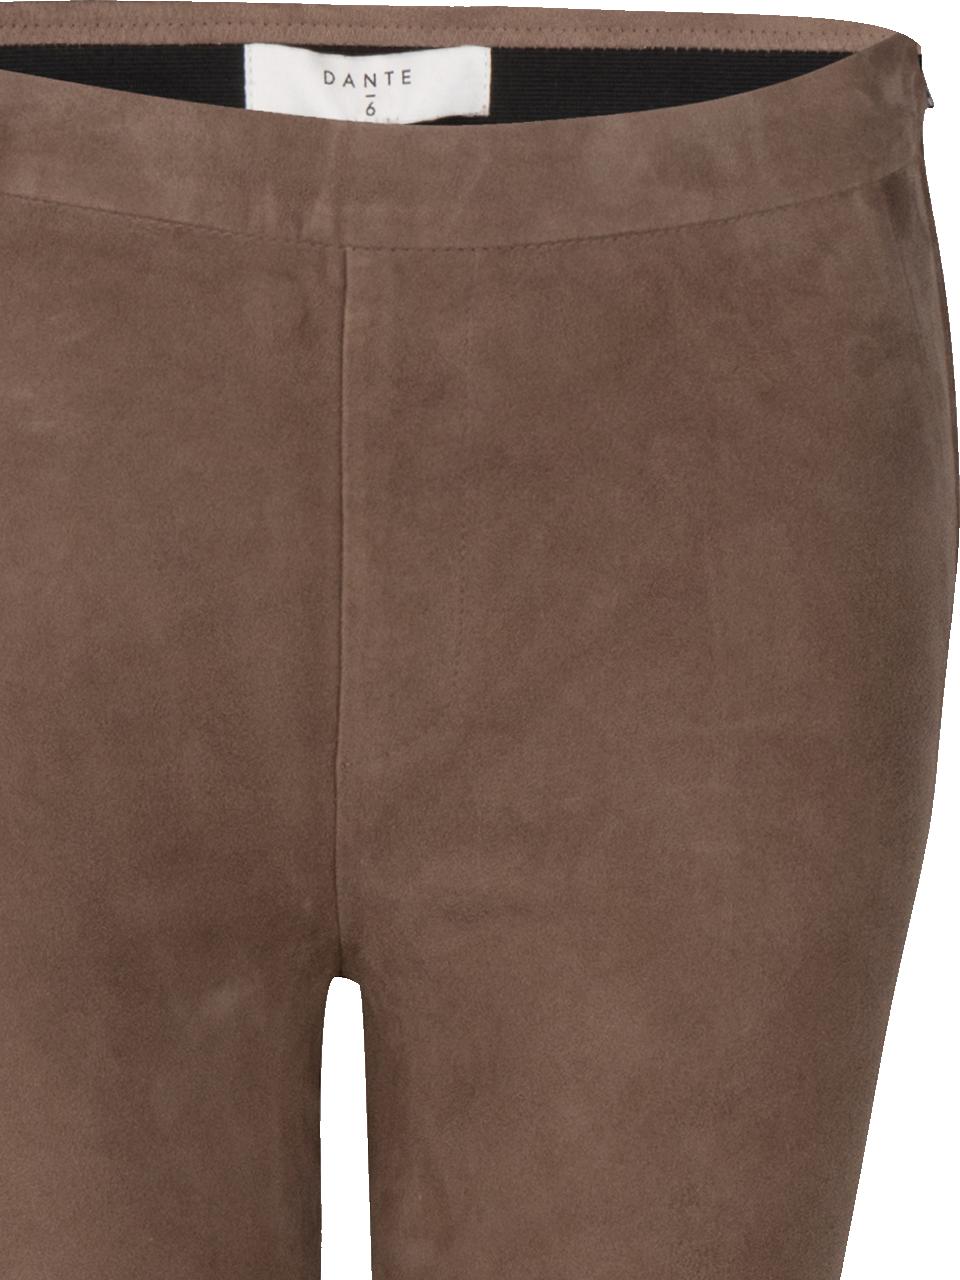 Dollmann flare suede pants-3